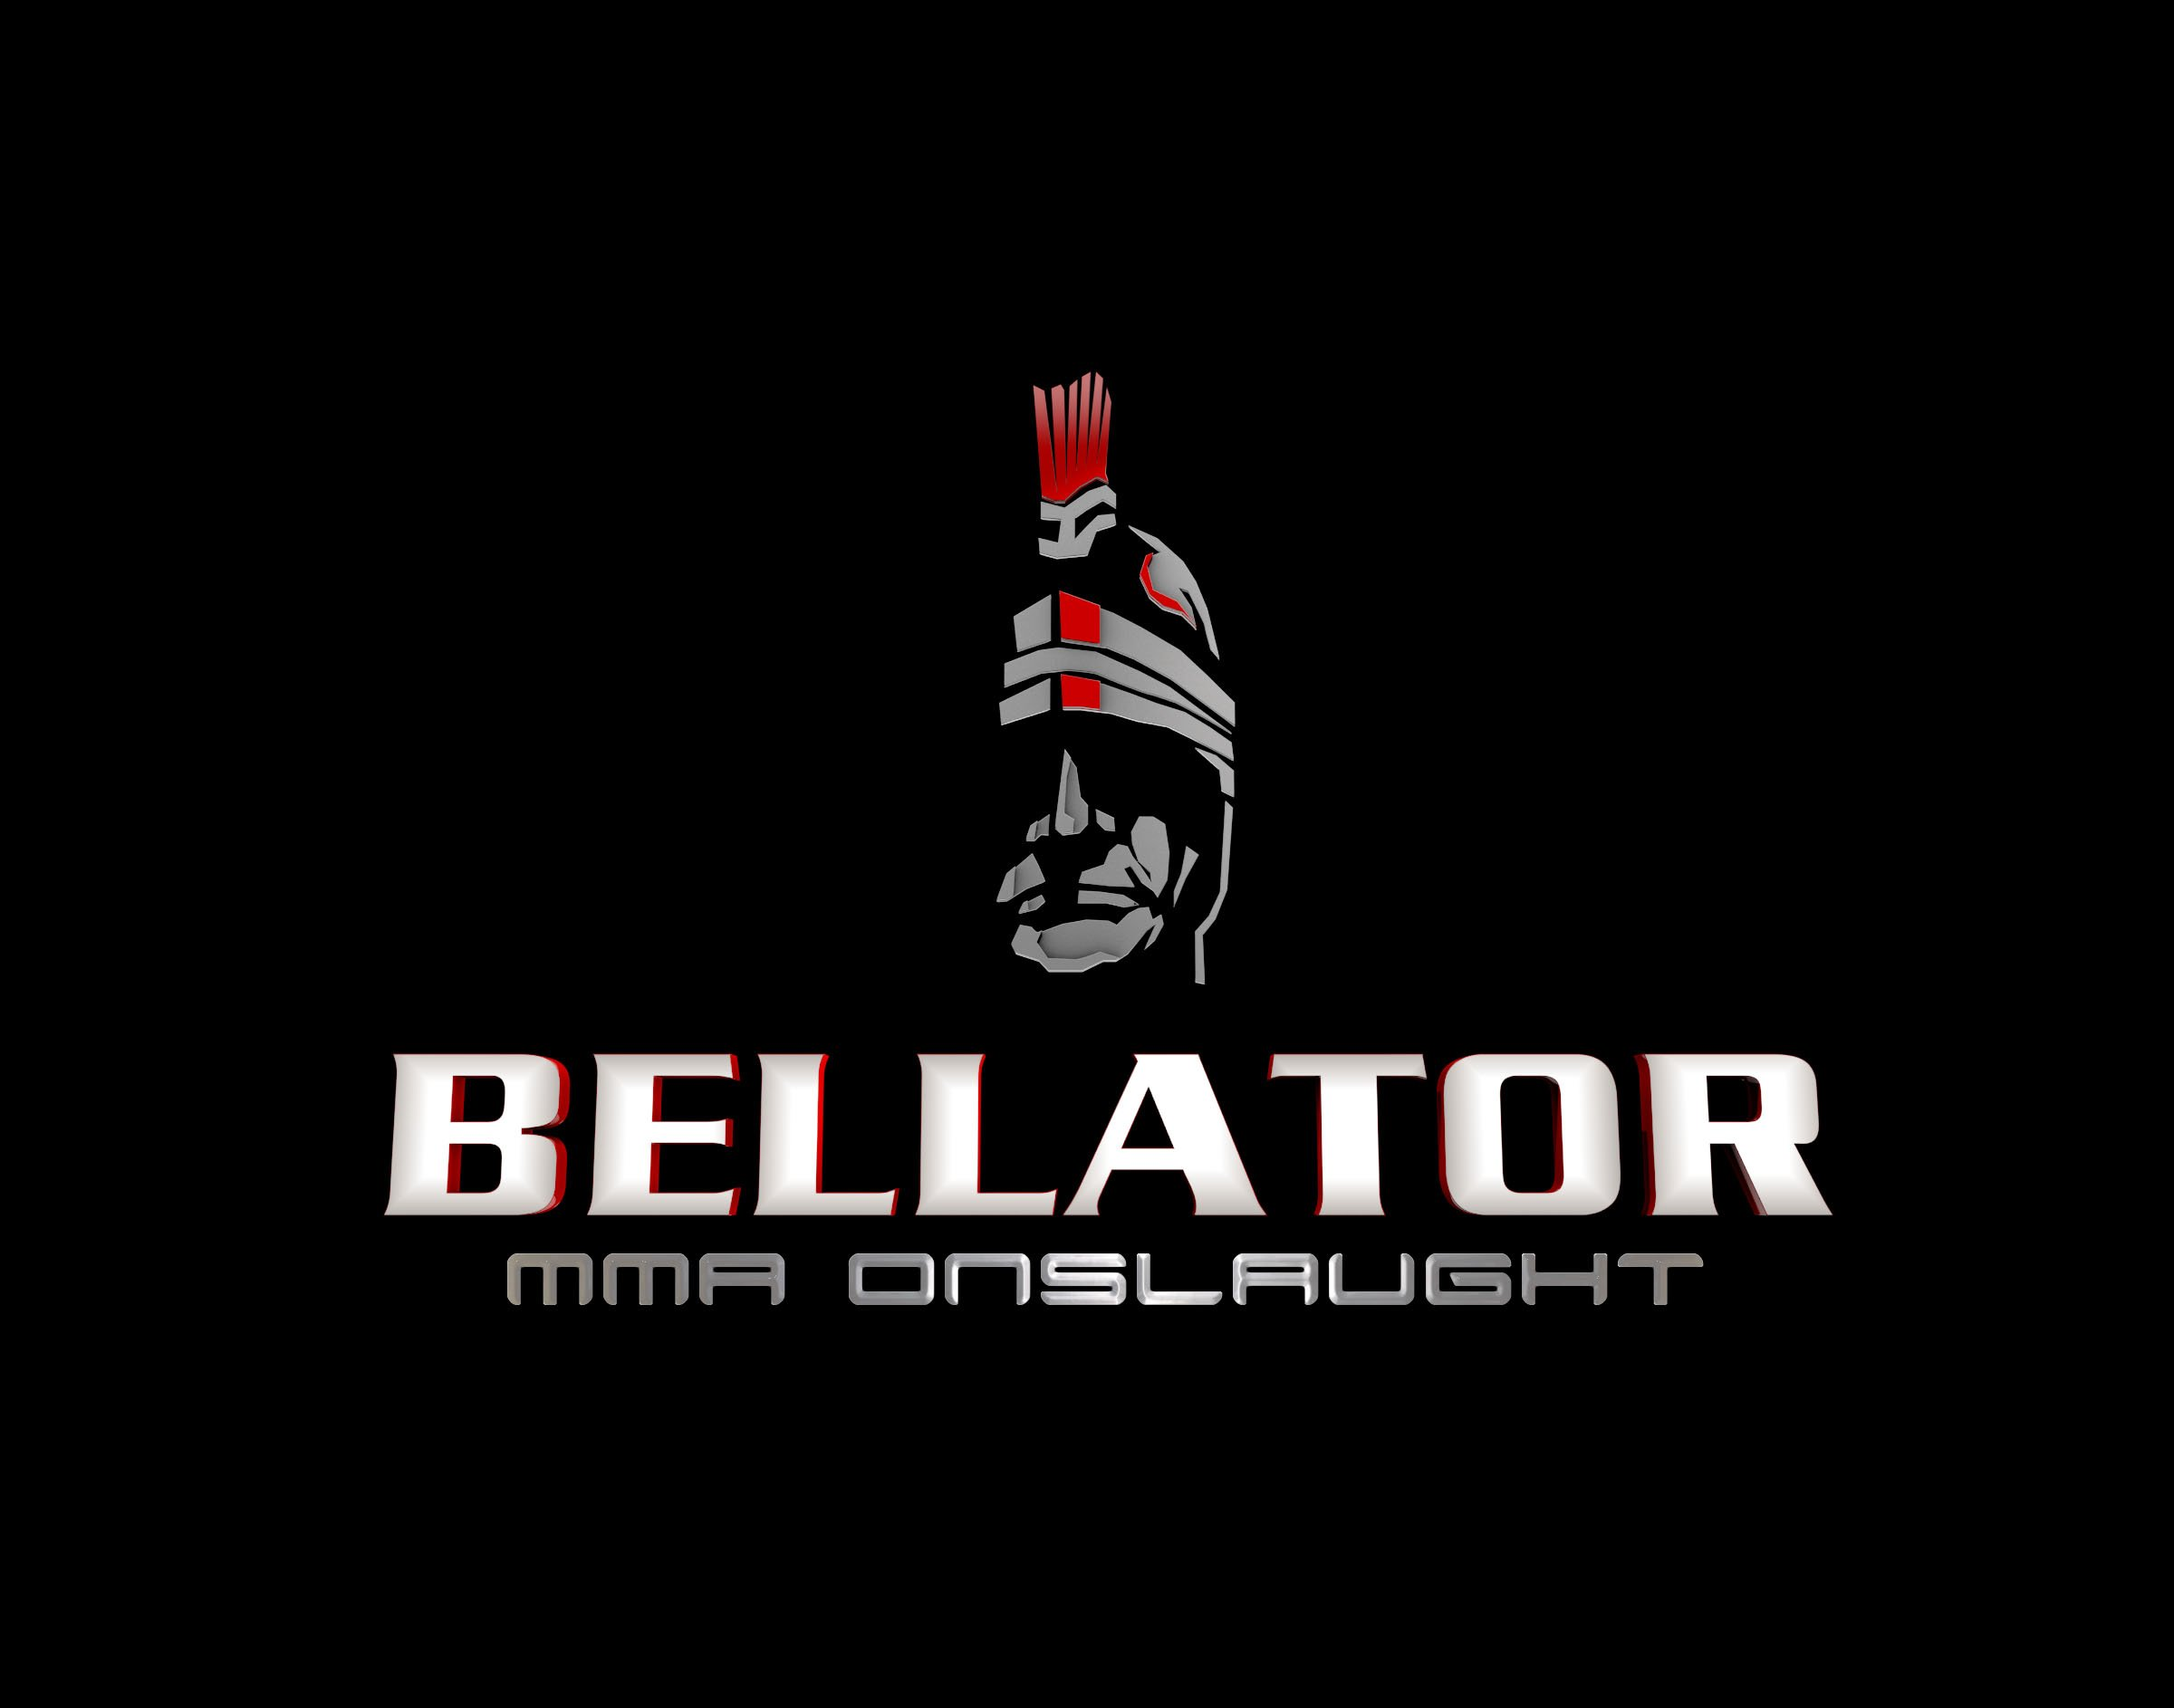 Bellator_MMA Onslaught_FIN